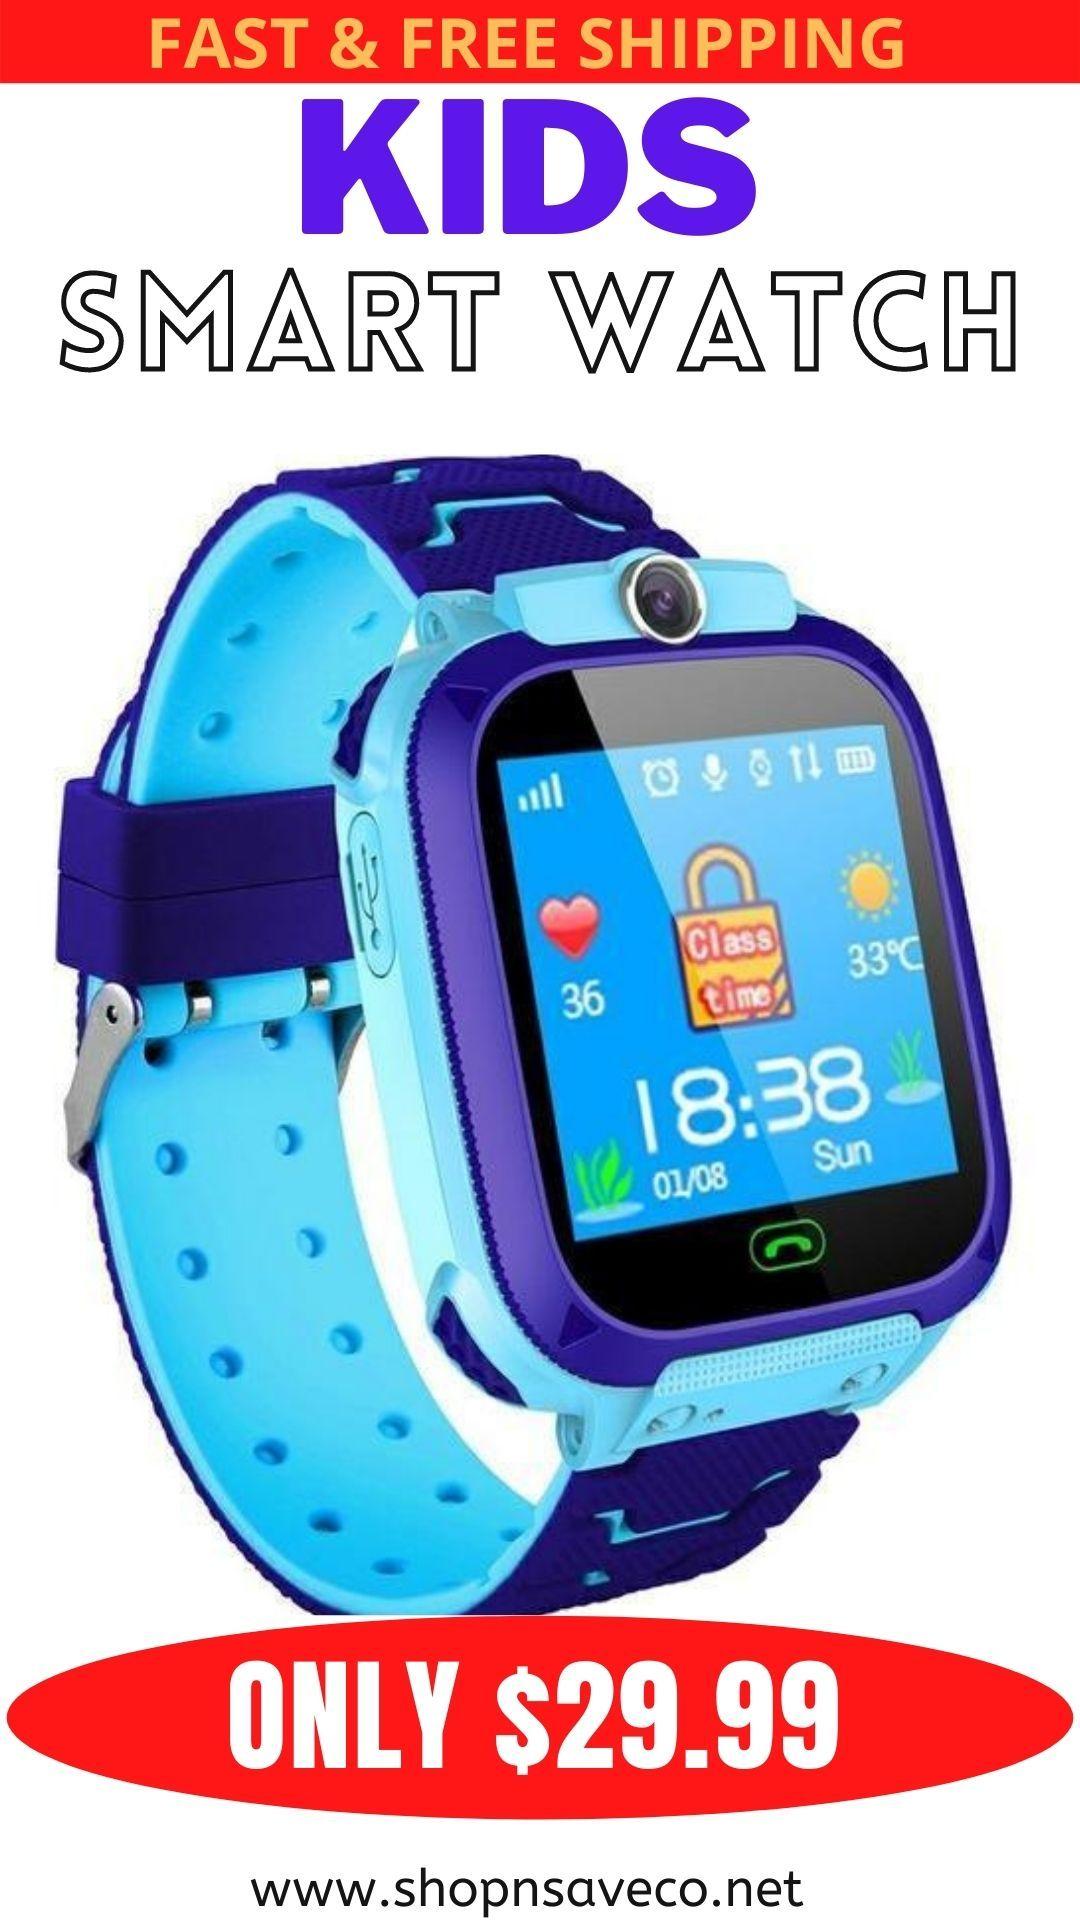 images?q=tbn:ANd9GcQh_l3eQ5xwiPy07kGEXjmjgmBKBRB7H2mRxCGhv1tFWg5c_mWT Smart Watch Ultra Thin Body